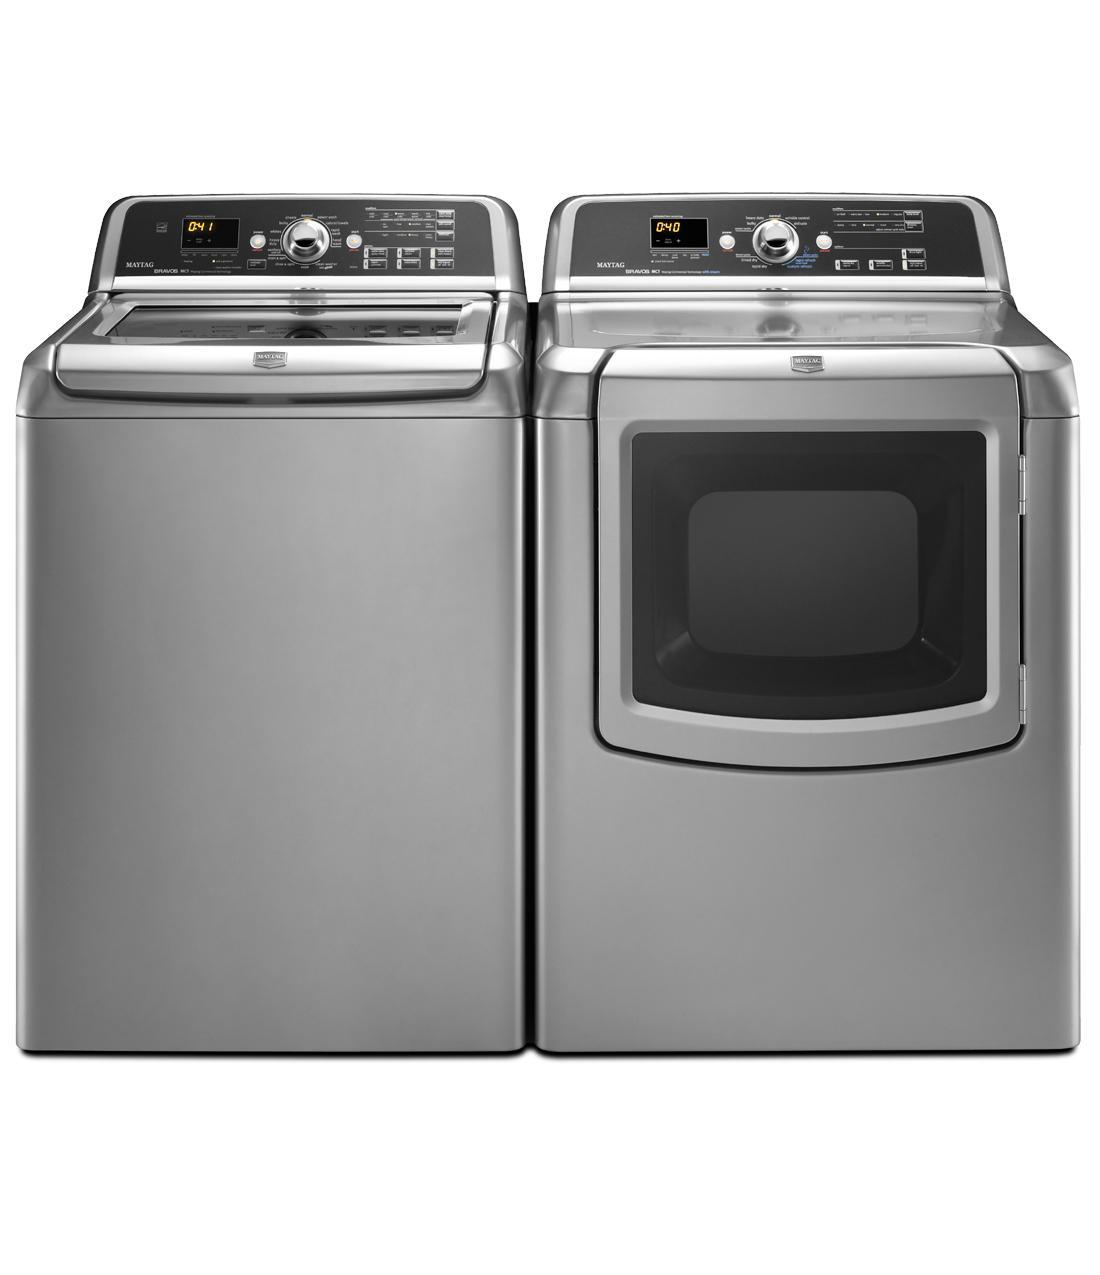 Mvwb850wl maytag mvwb850wl bravos series top load washers - Maytag whirlpool ...